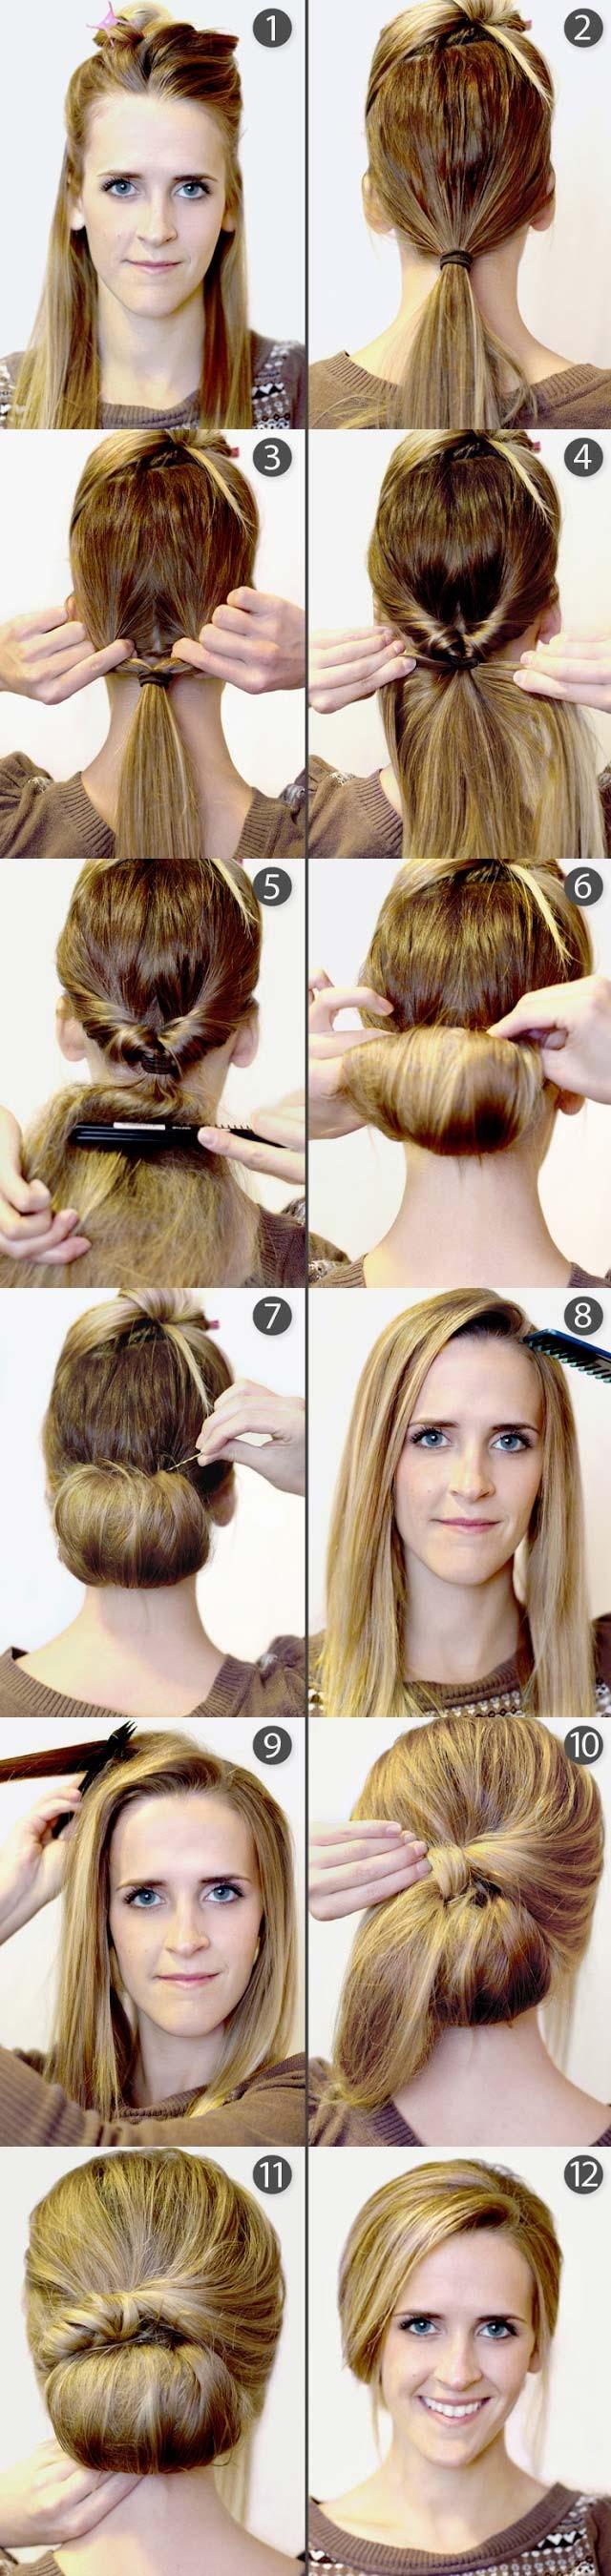 Terrific 15 Cute Hairstyles Step By Step Hairstyles For Long Hair Short Hairstyles Gunalazisus